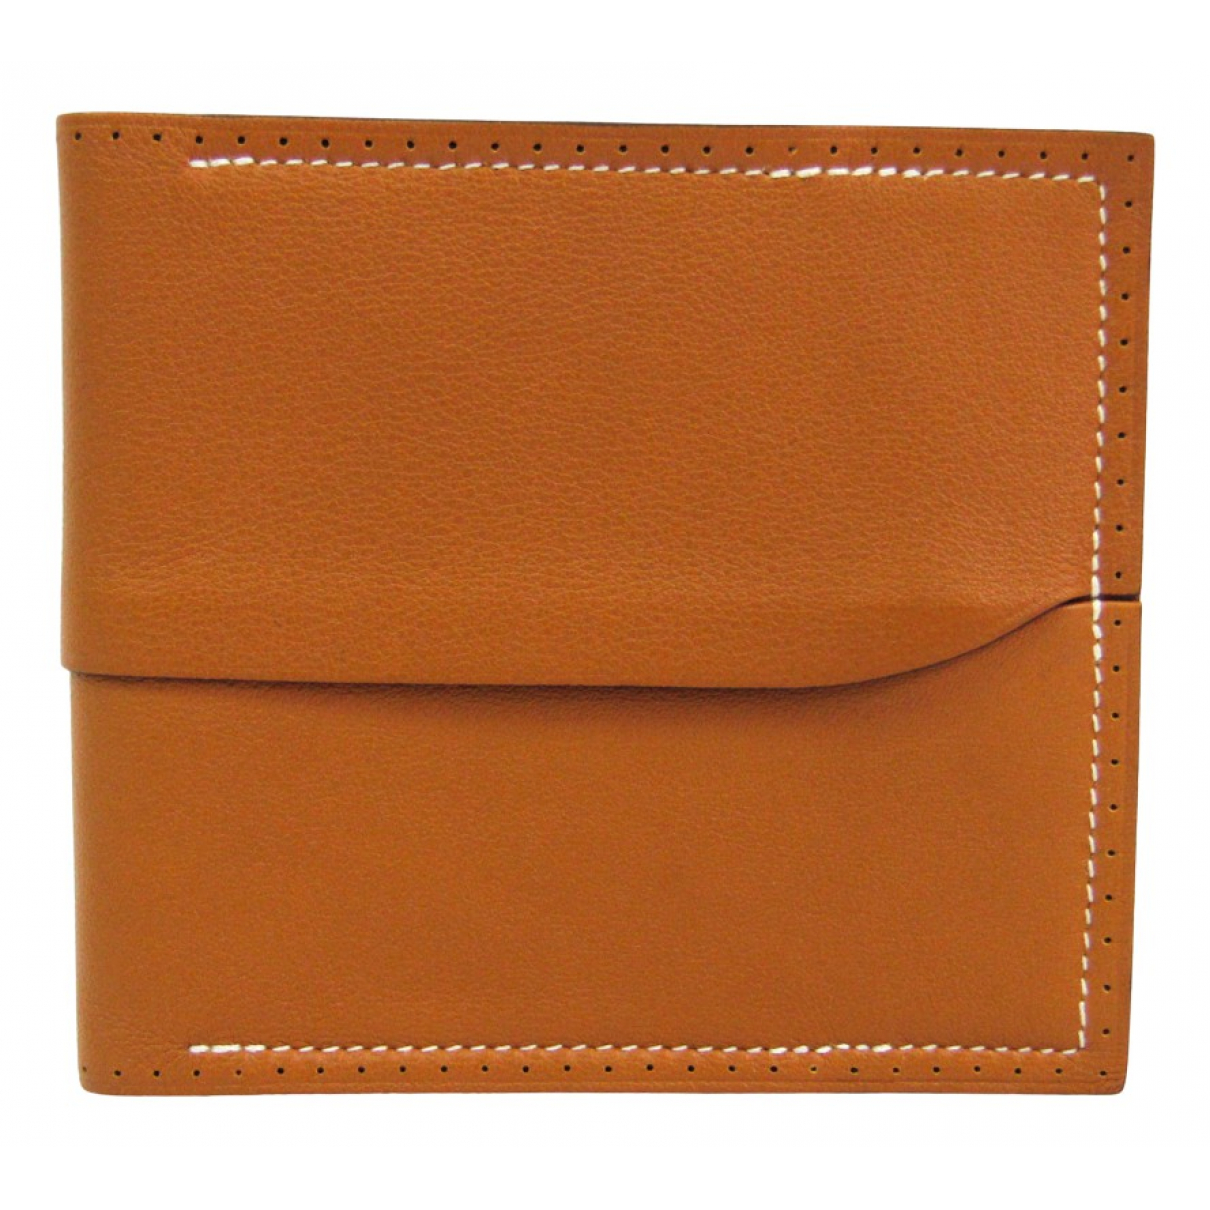 Hermes \N Portemonnaie in  Gold Leder